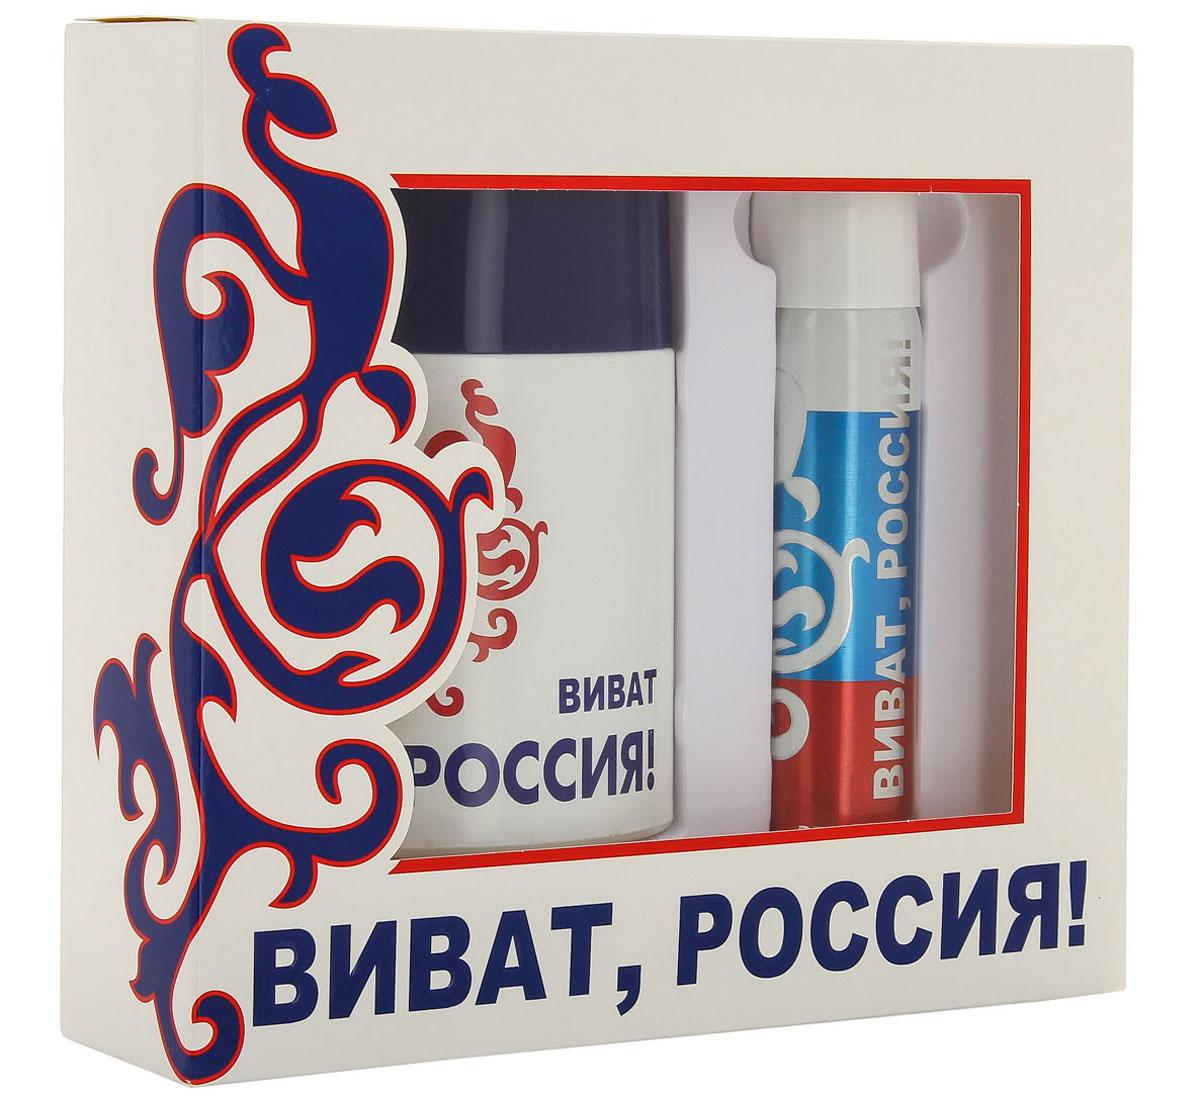 КПК-Парфюм Подарочный набор для мужчин Виват Россия белый: Туалетная вода, 100 мл + Парфюмированный дезодорант, 75 млКПК228ВИВАТ РОССИЯ БЕЛЫЙ- это аромат для мужчин. Верхние ноты: розмарин, ананас, нероли, бергамот, лимон; ноты сердца: цикламен, кориандр, жасмин, мох; ноты базы: сандал, тонка бобы, мускус, дубовый мох, кедр, палисандр и кардамон.